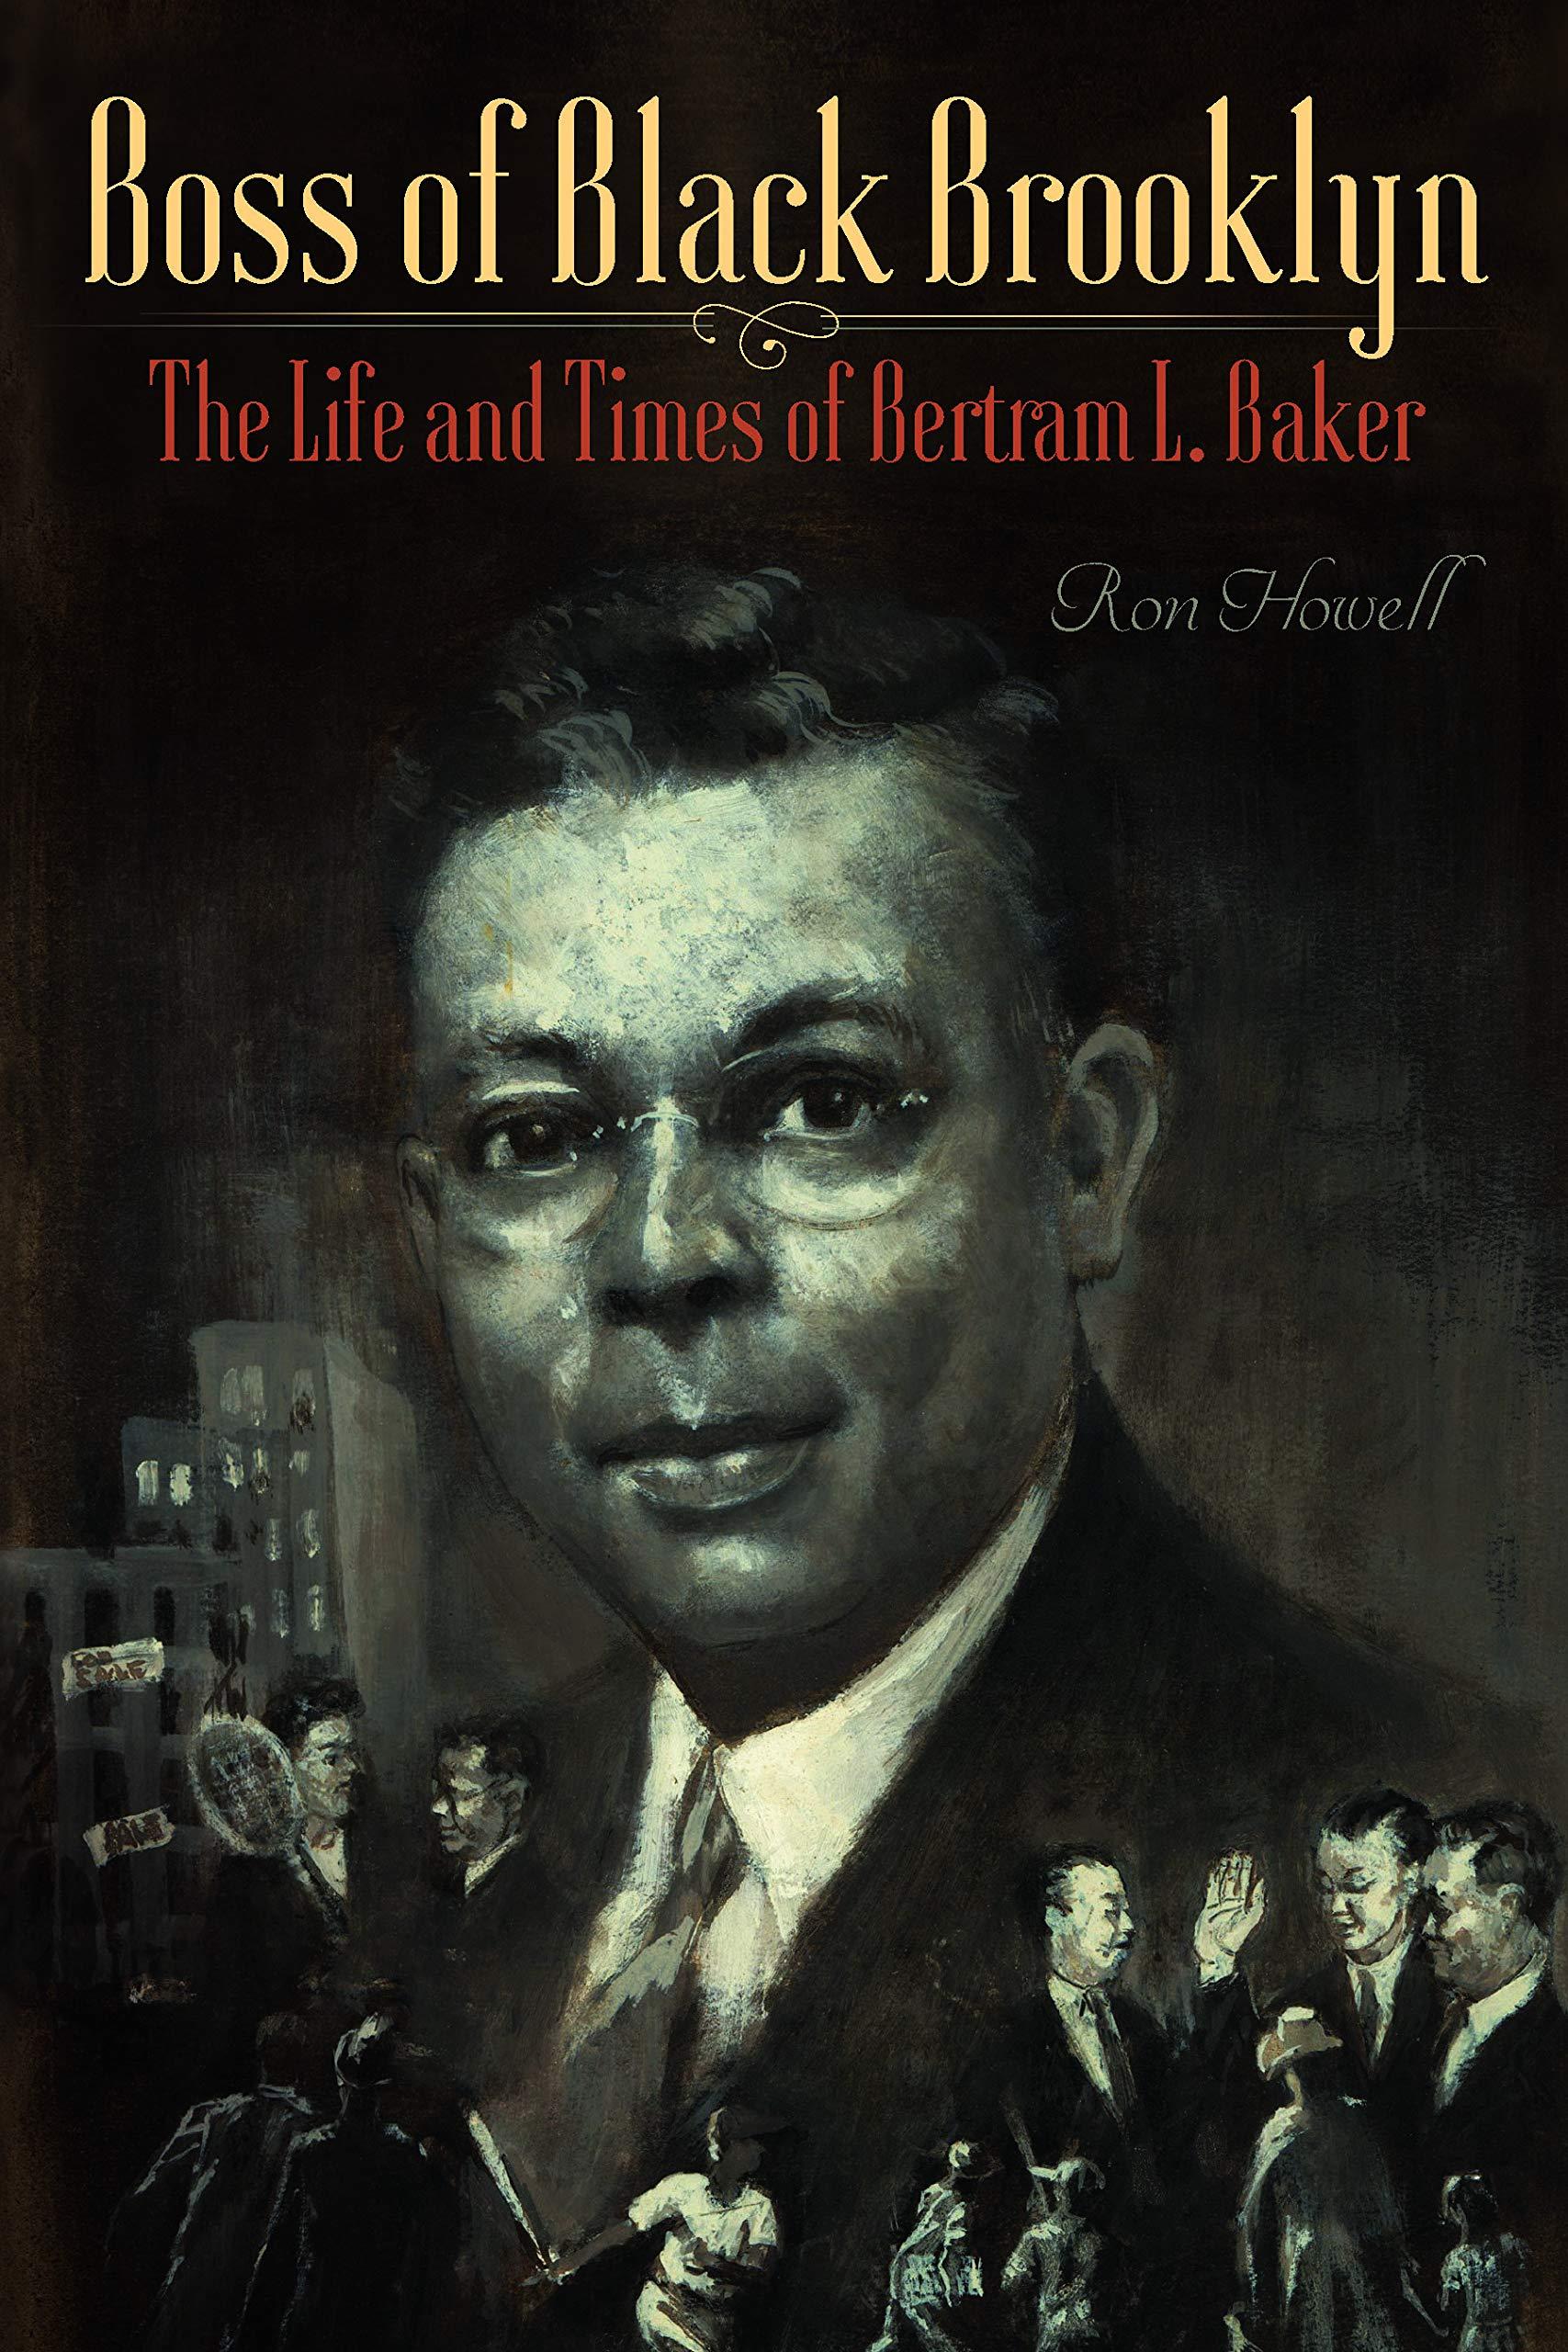 Boss of Black Brooklyn: The Life and Times of Bertram L. Baker ...